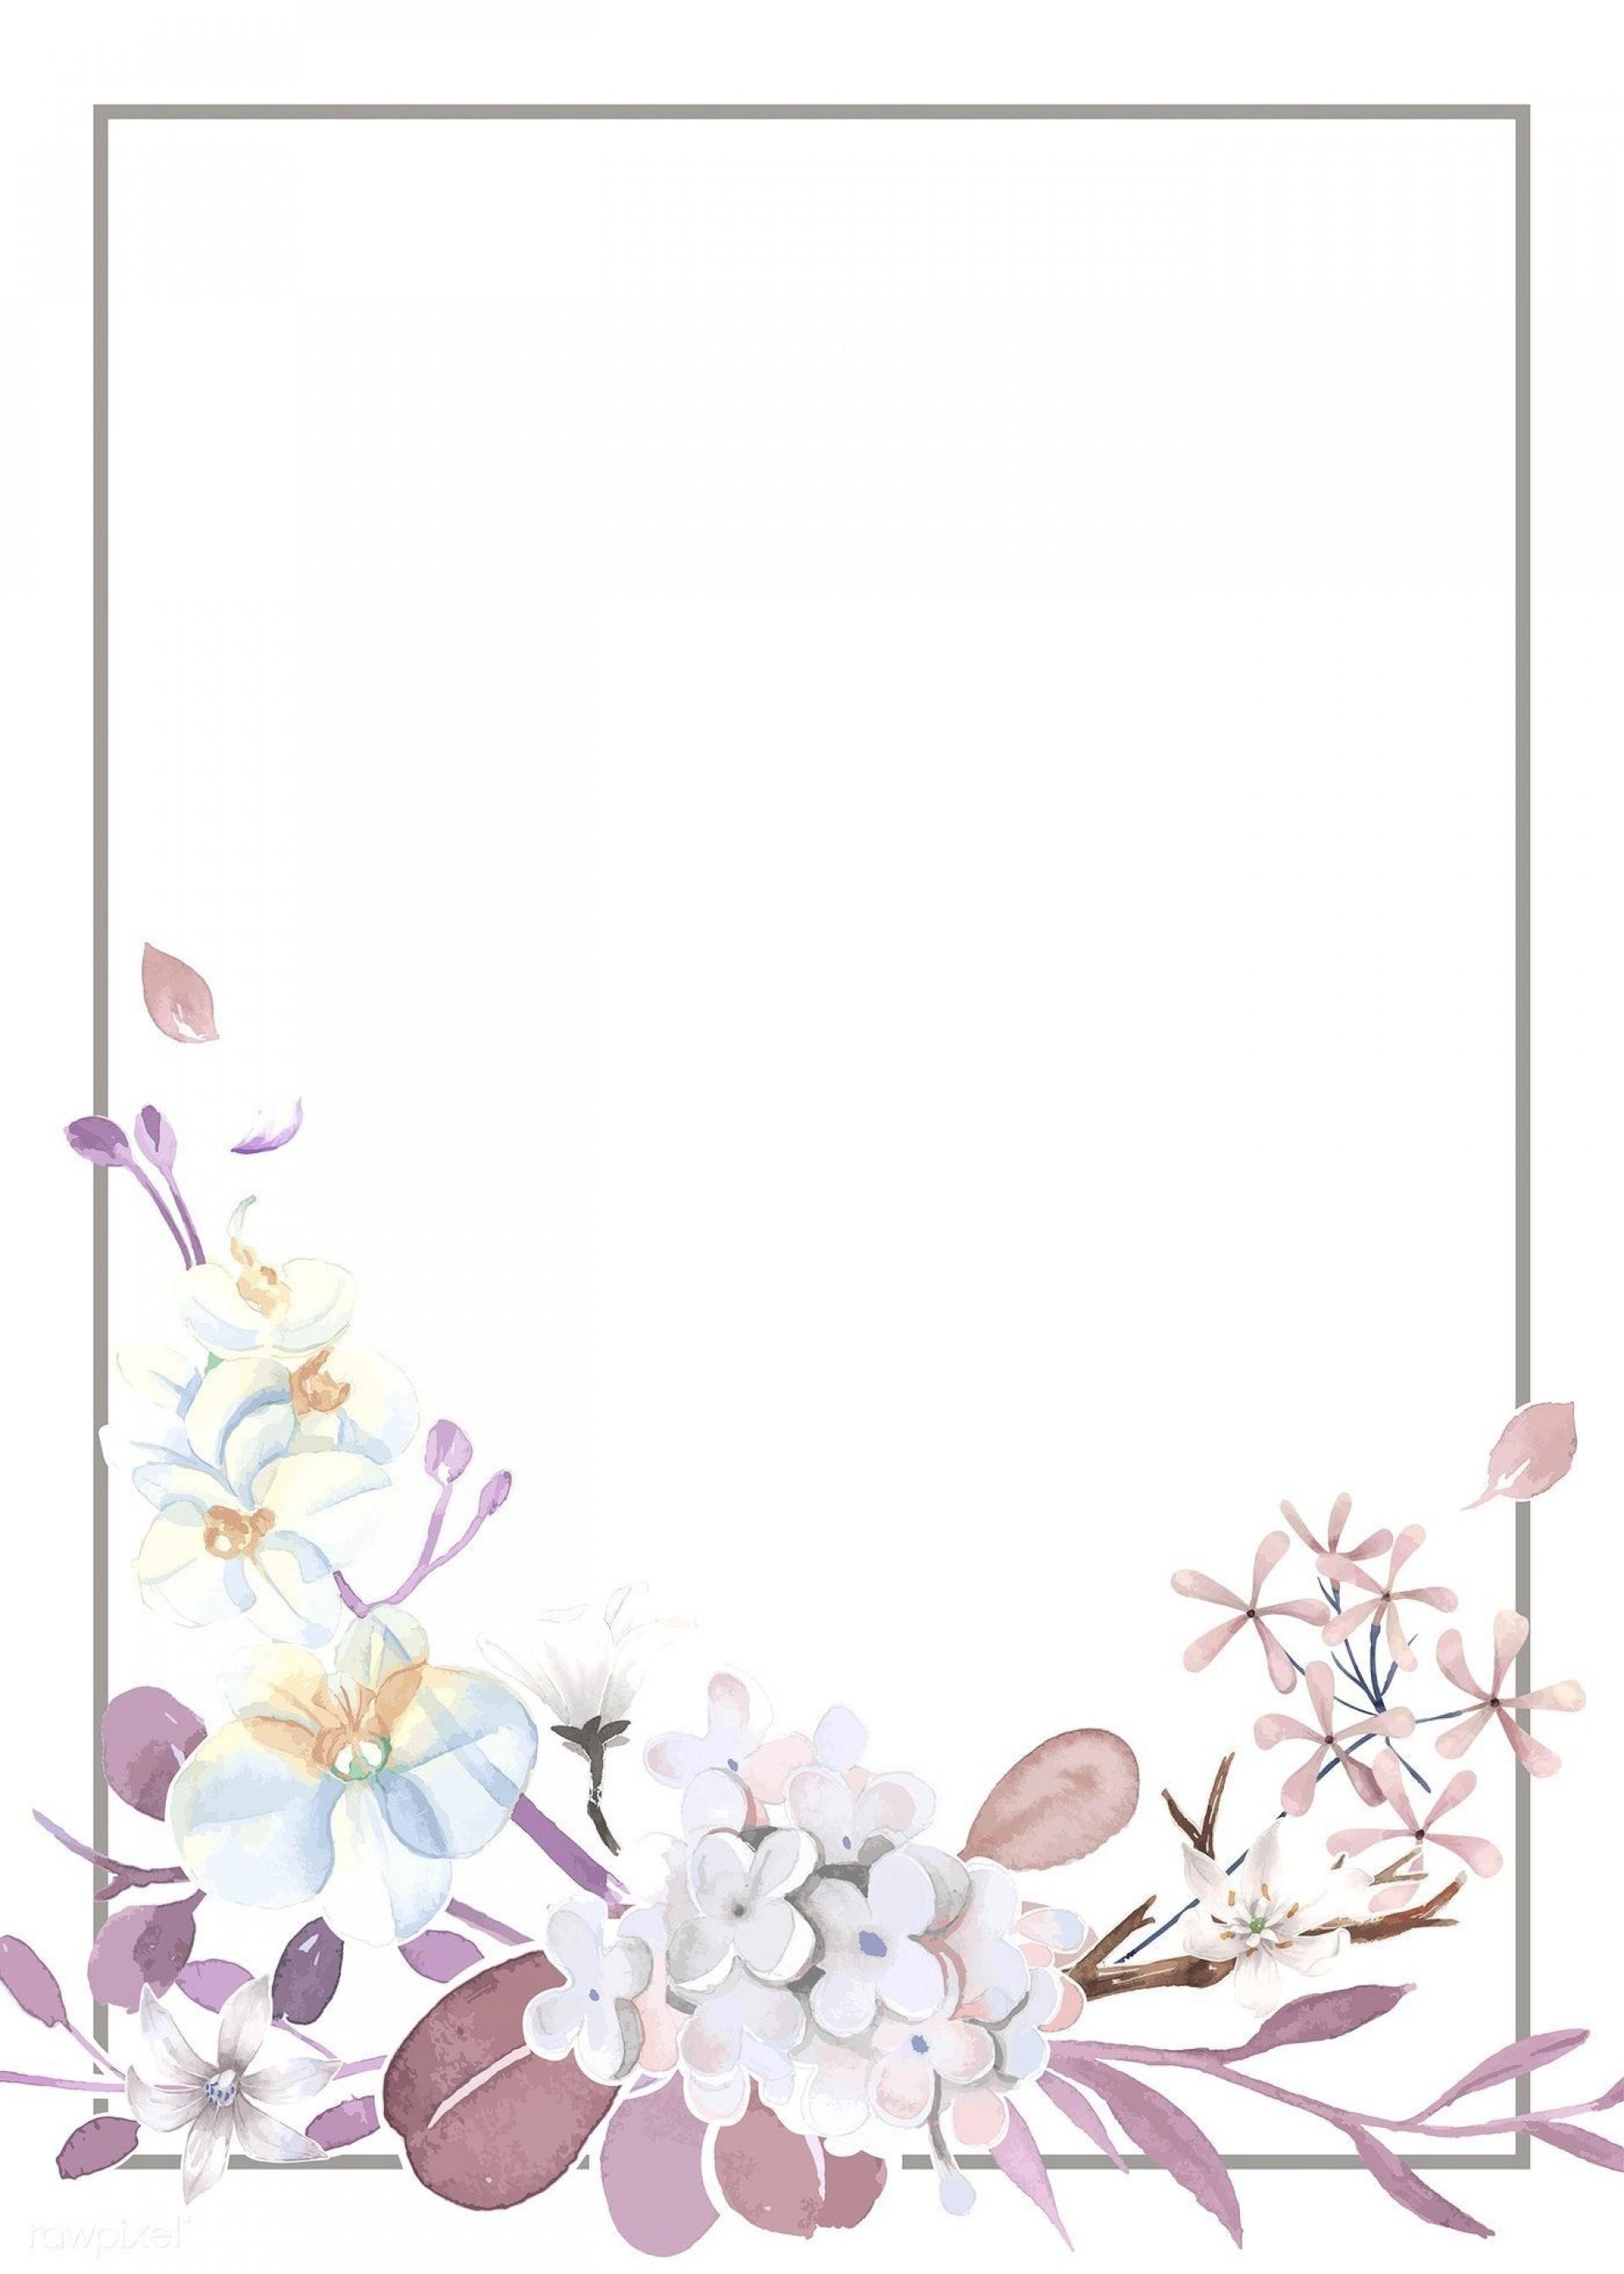 004 Phenomenal Printable Greeting Card Template High Definition  Templates Print Free Birthday1920